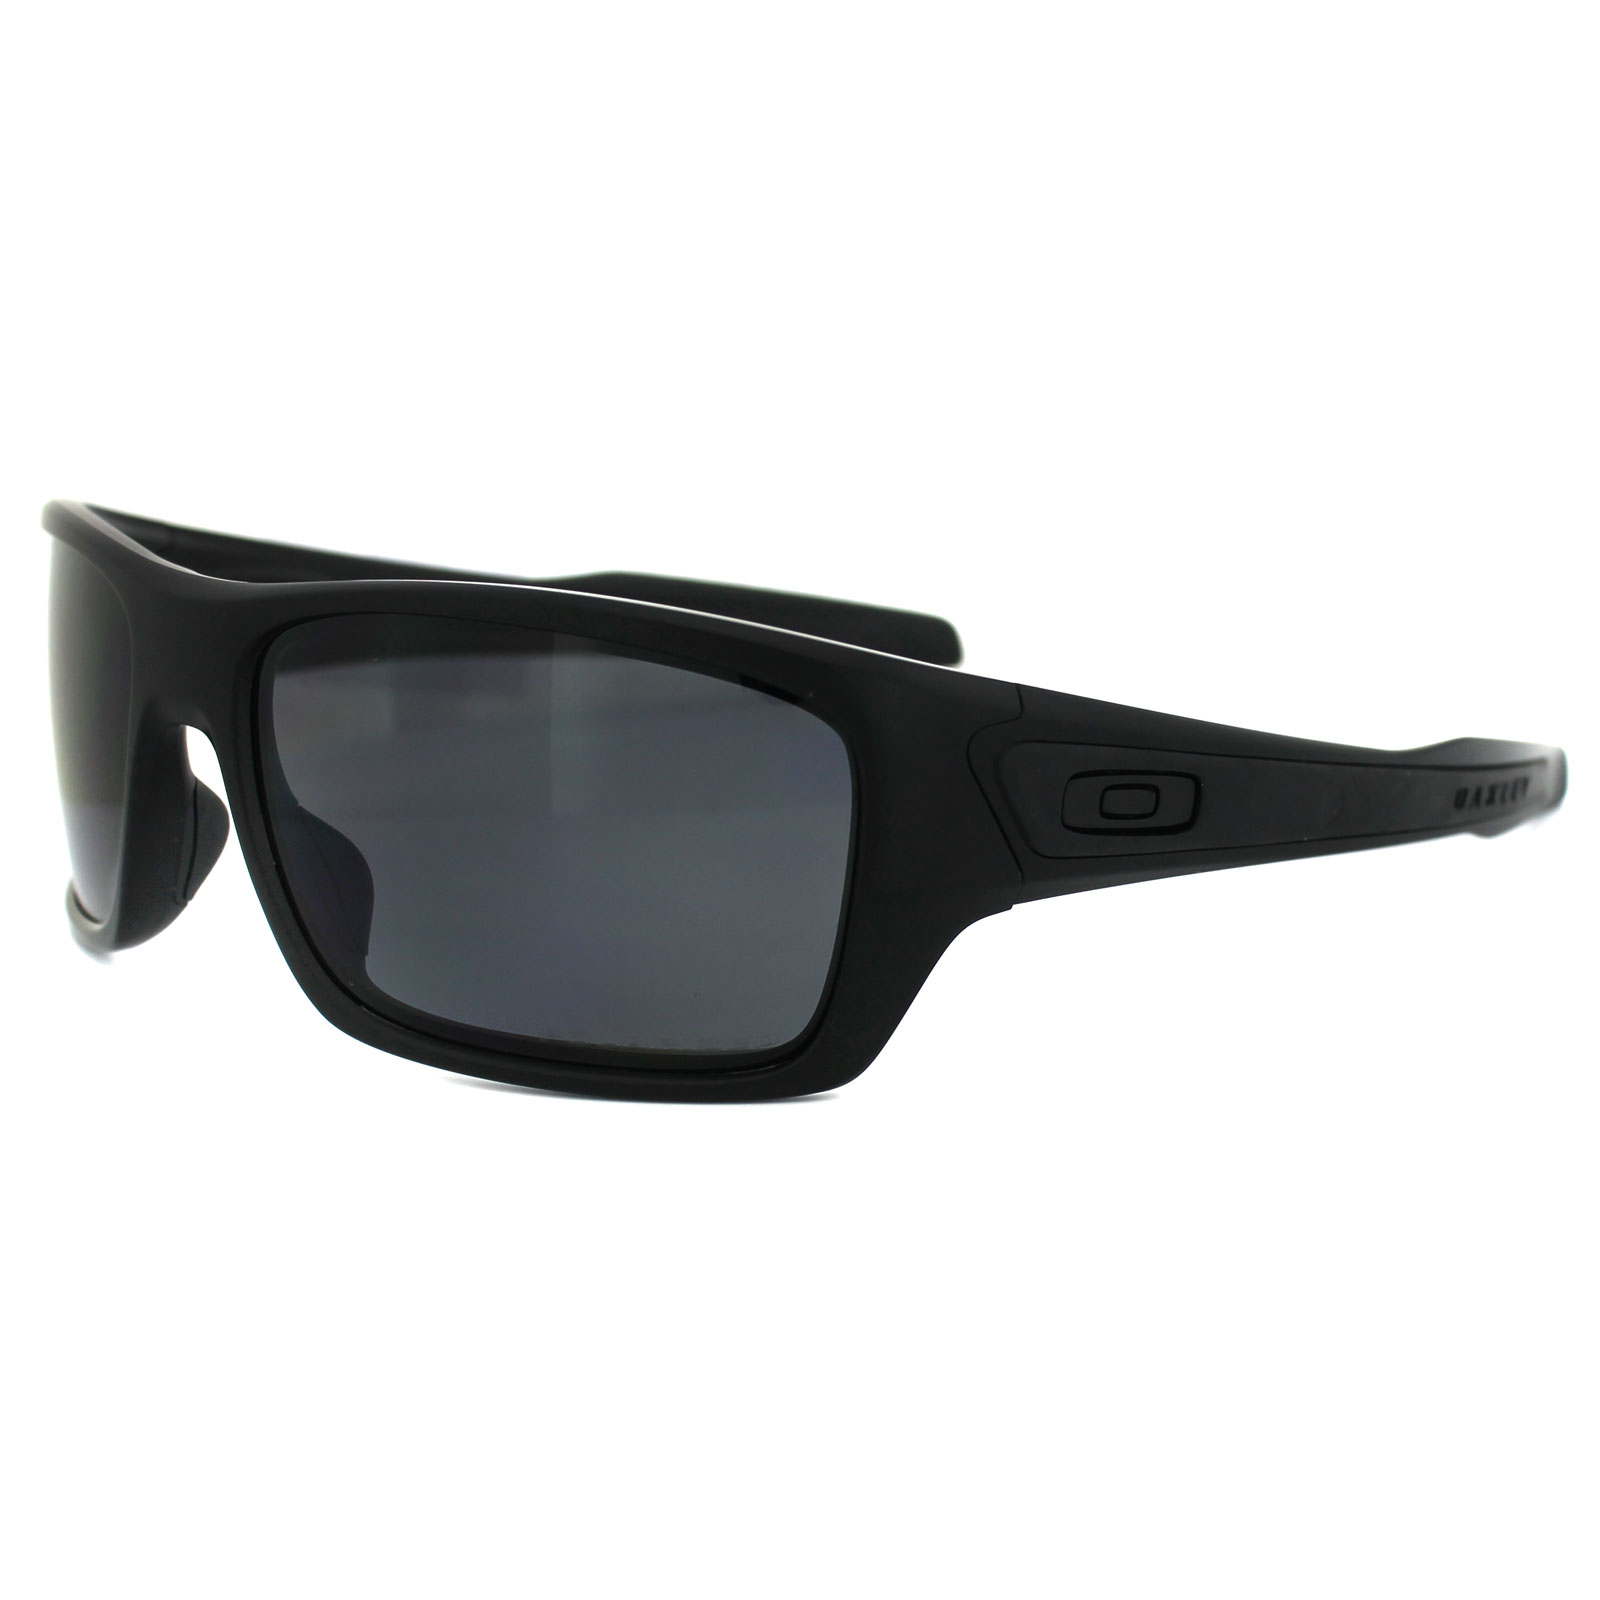 514556c18a Sentinel Oakley Sunglasses Turbine OO9263-07 Matte Black Grey Polarized